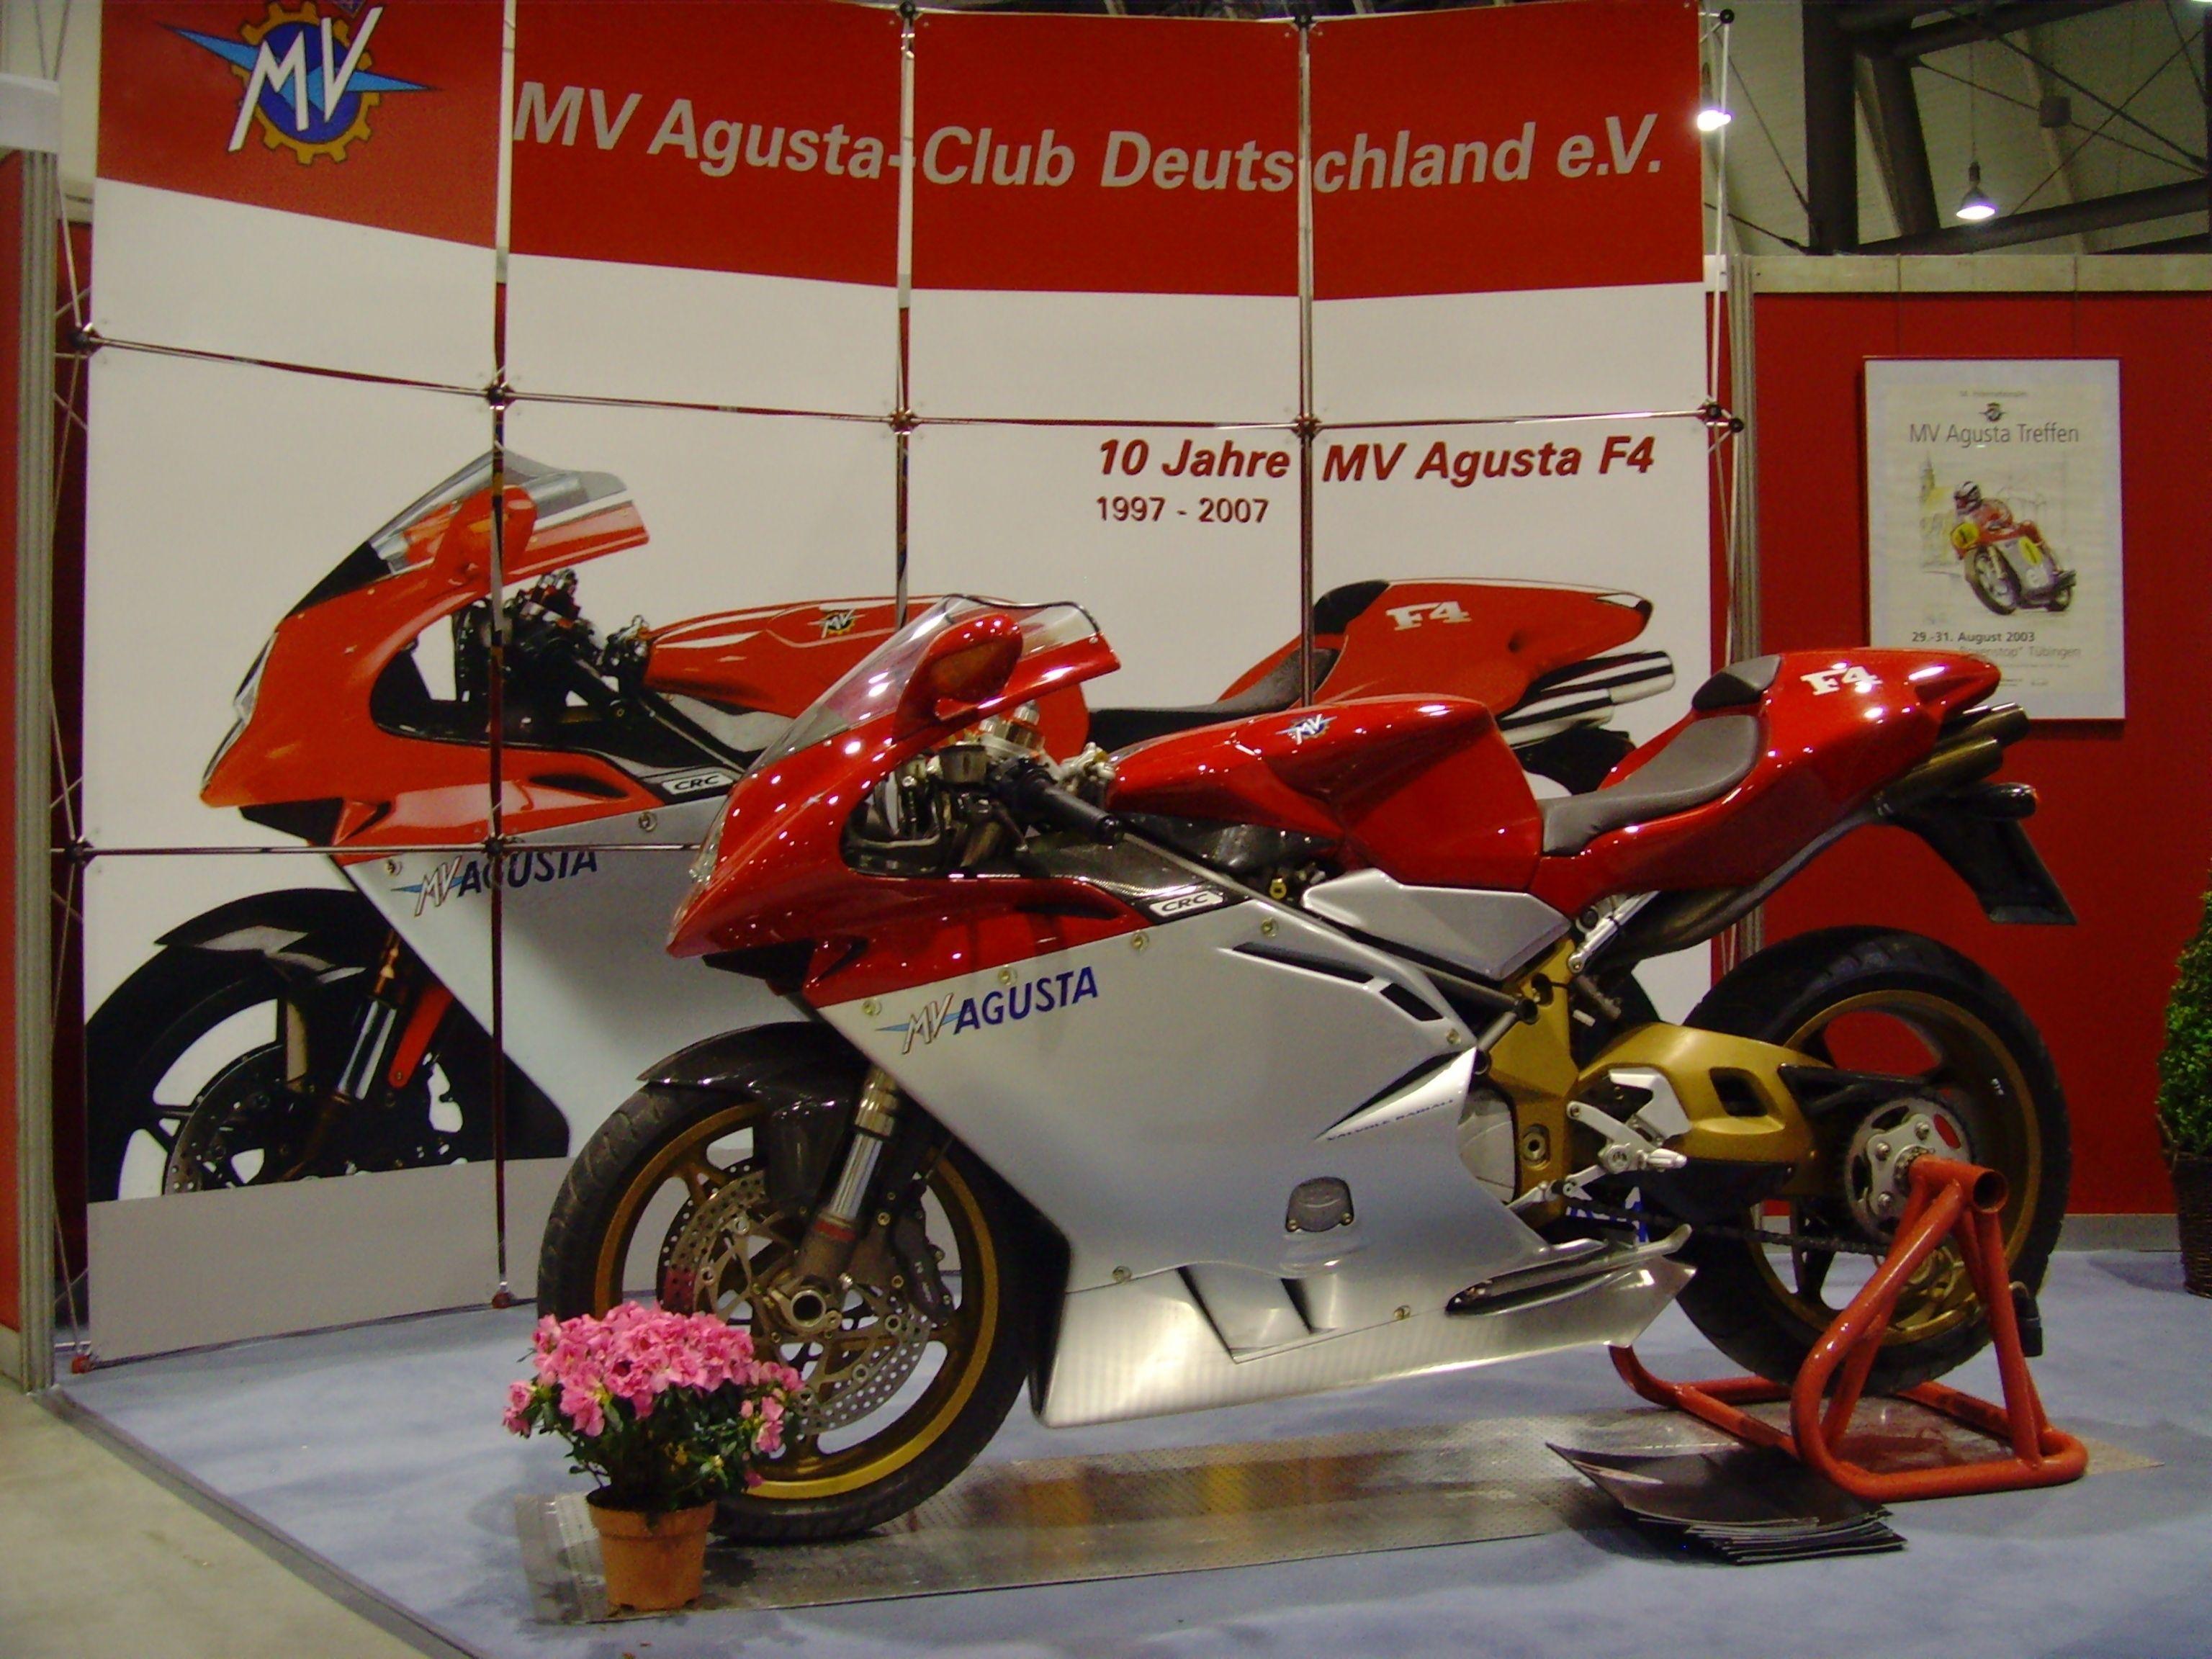 Mv Agusta F4 750 Oro Mv Agusta Racing Bikes Bobber Motorcycle